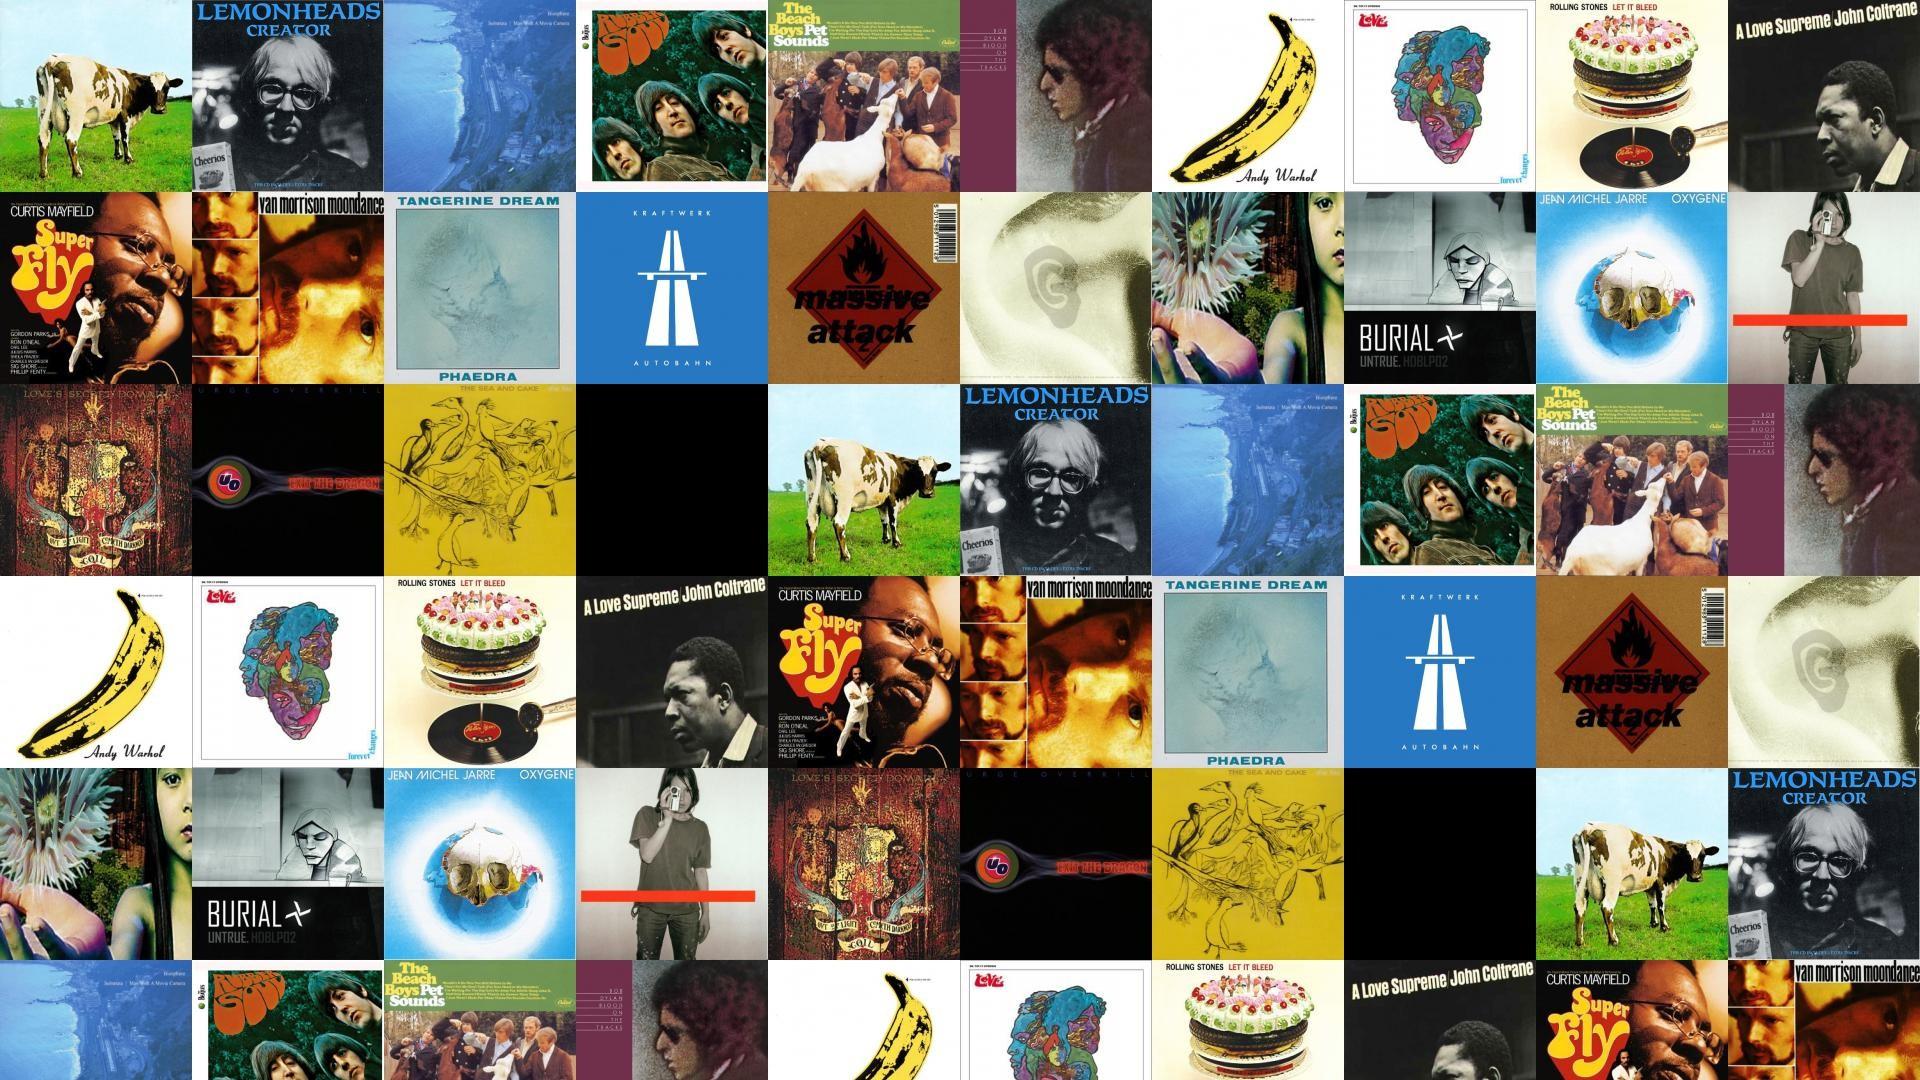 Pink Floyd Atom Heart Mother Lemonheads Creator Biosphere Wallpaper Â« Tiled  Desktop Wallpaper